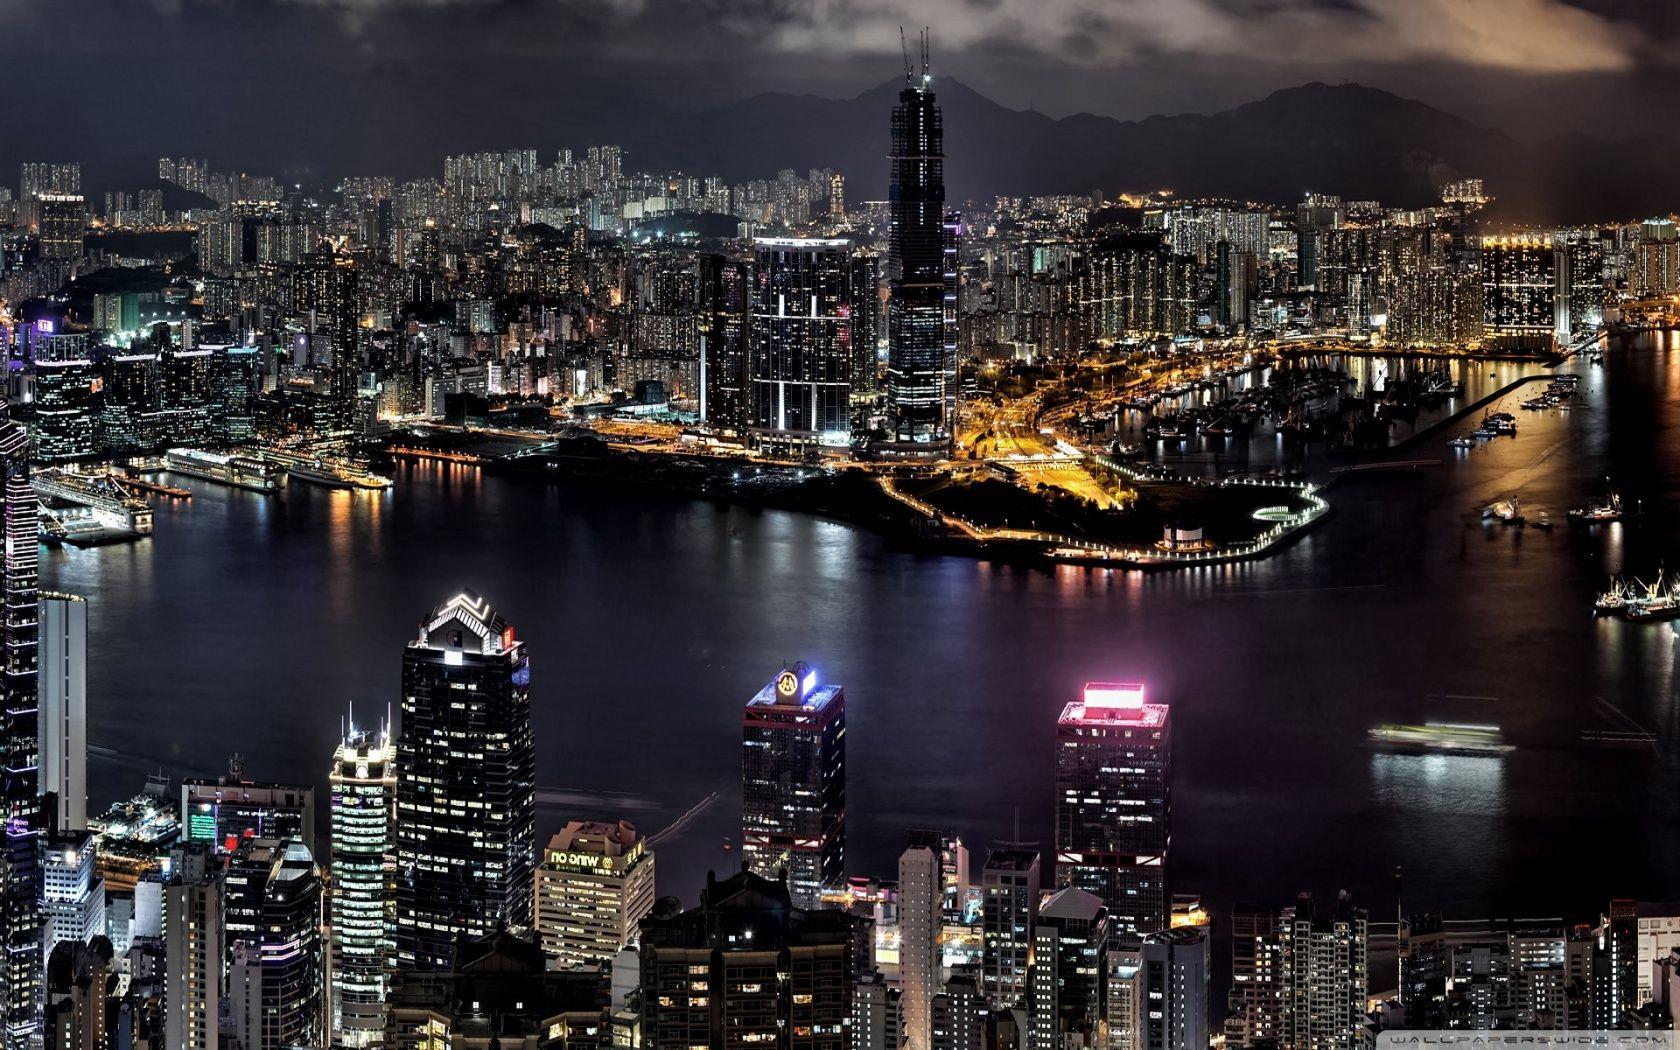 City Night View Hd Desktop Wallpaper Cityscape Wallpaper Night